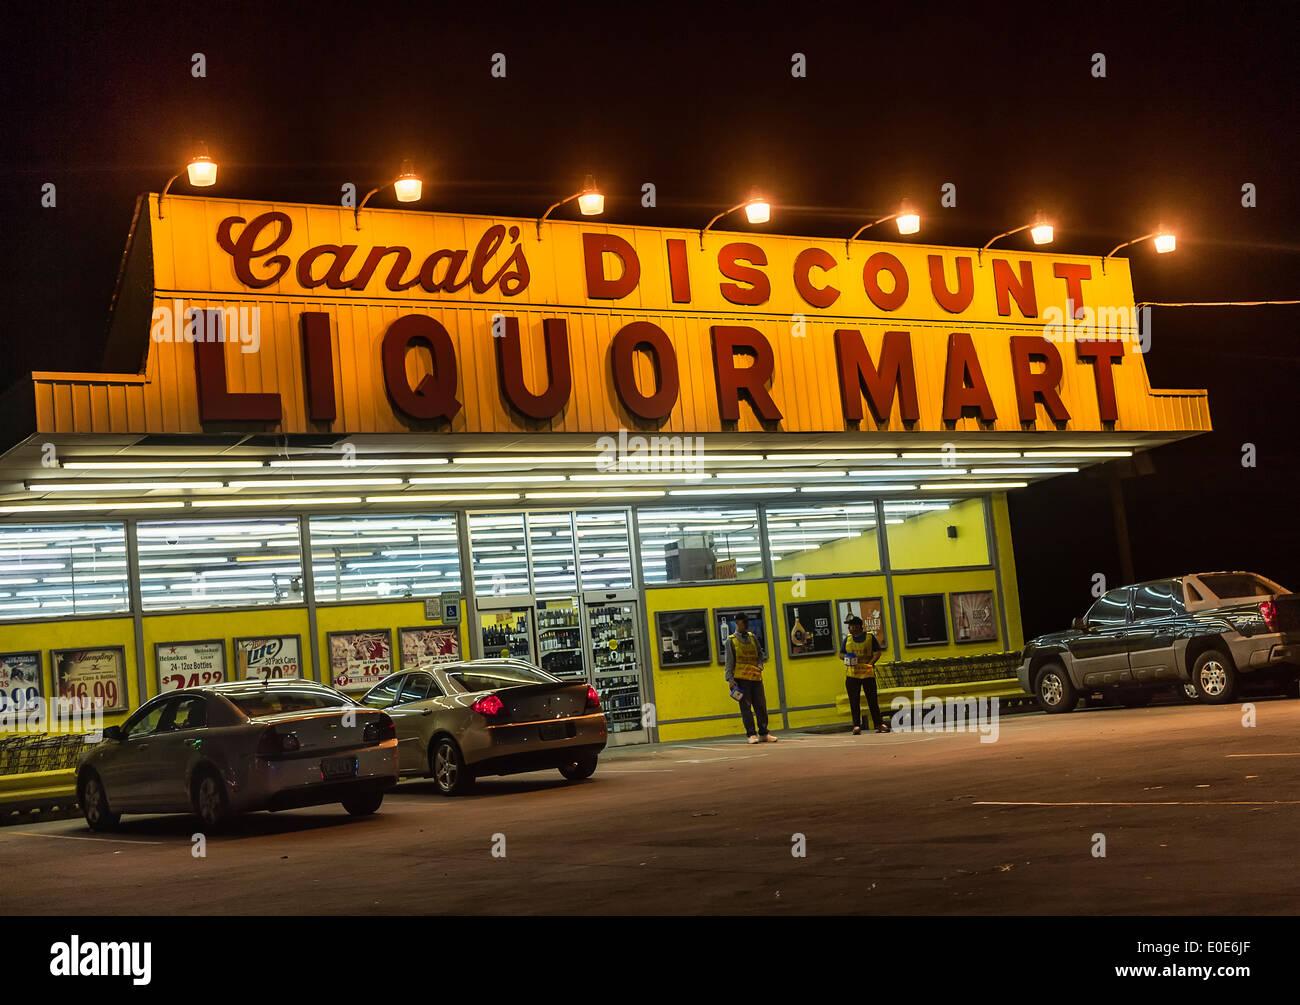 Discount liquor store at night. - Stock Image